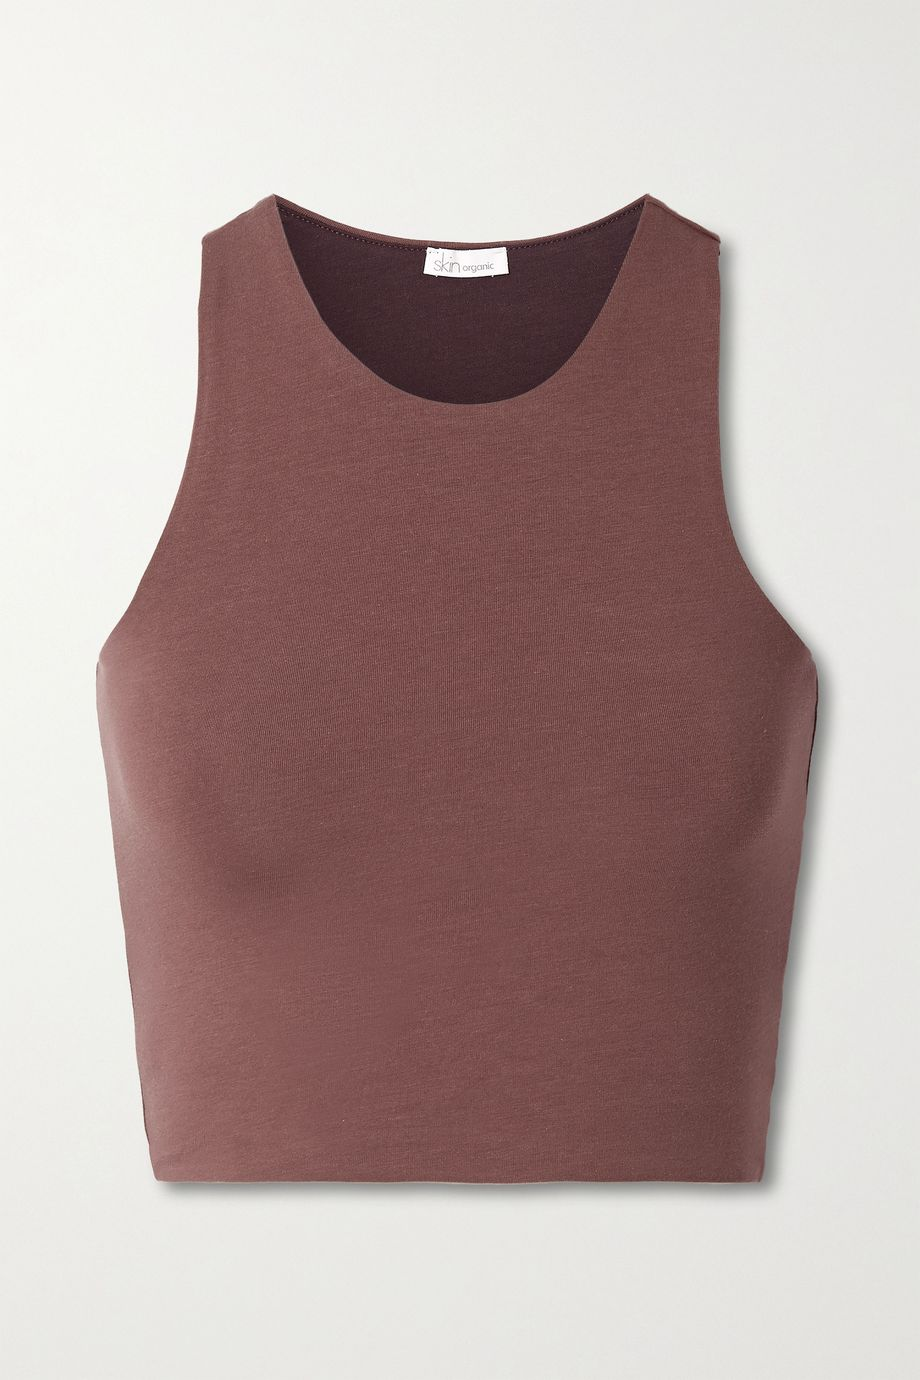 Skin + NET SUSTAIN Calliope reversible cropped organic Pima cotton-blend jersey tank